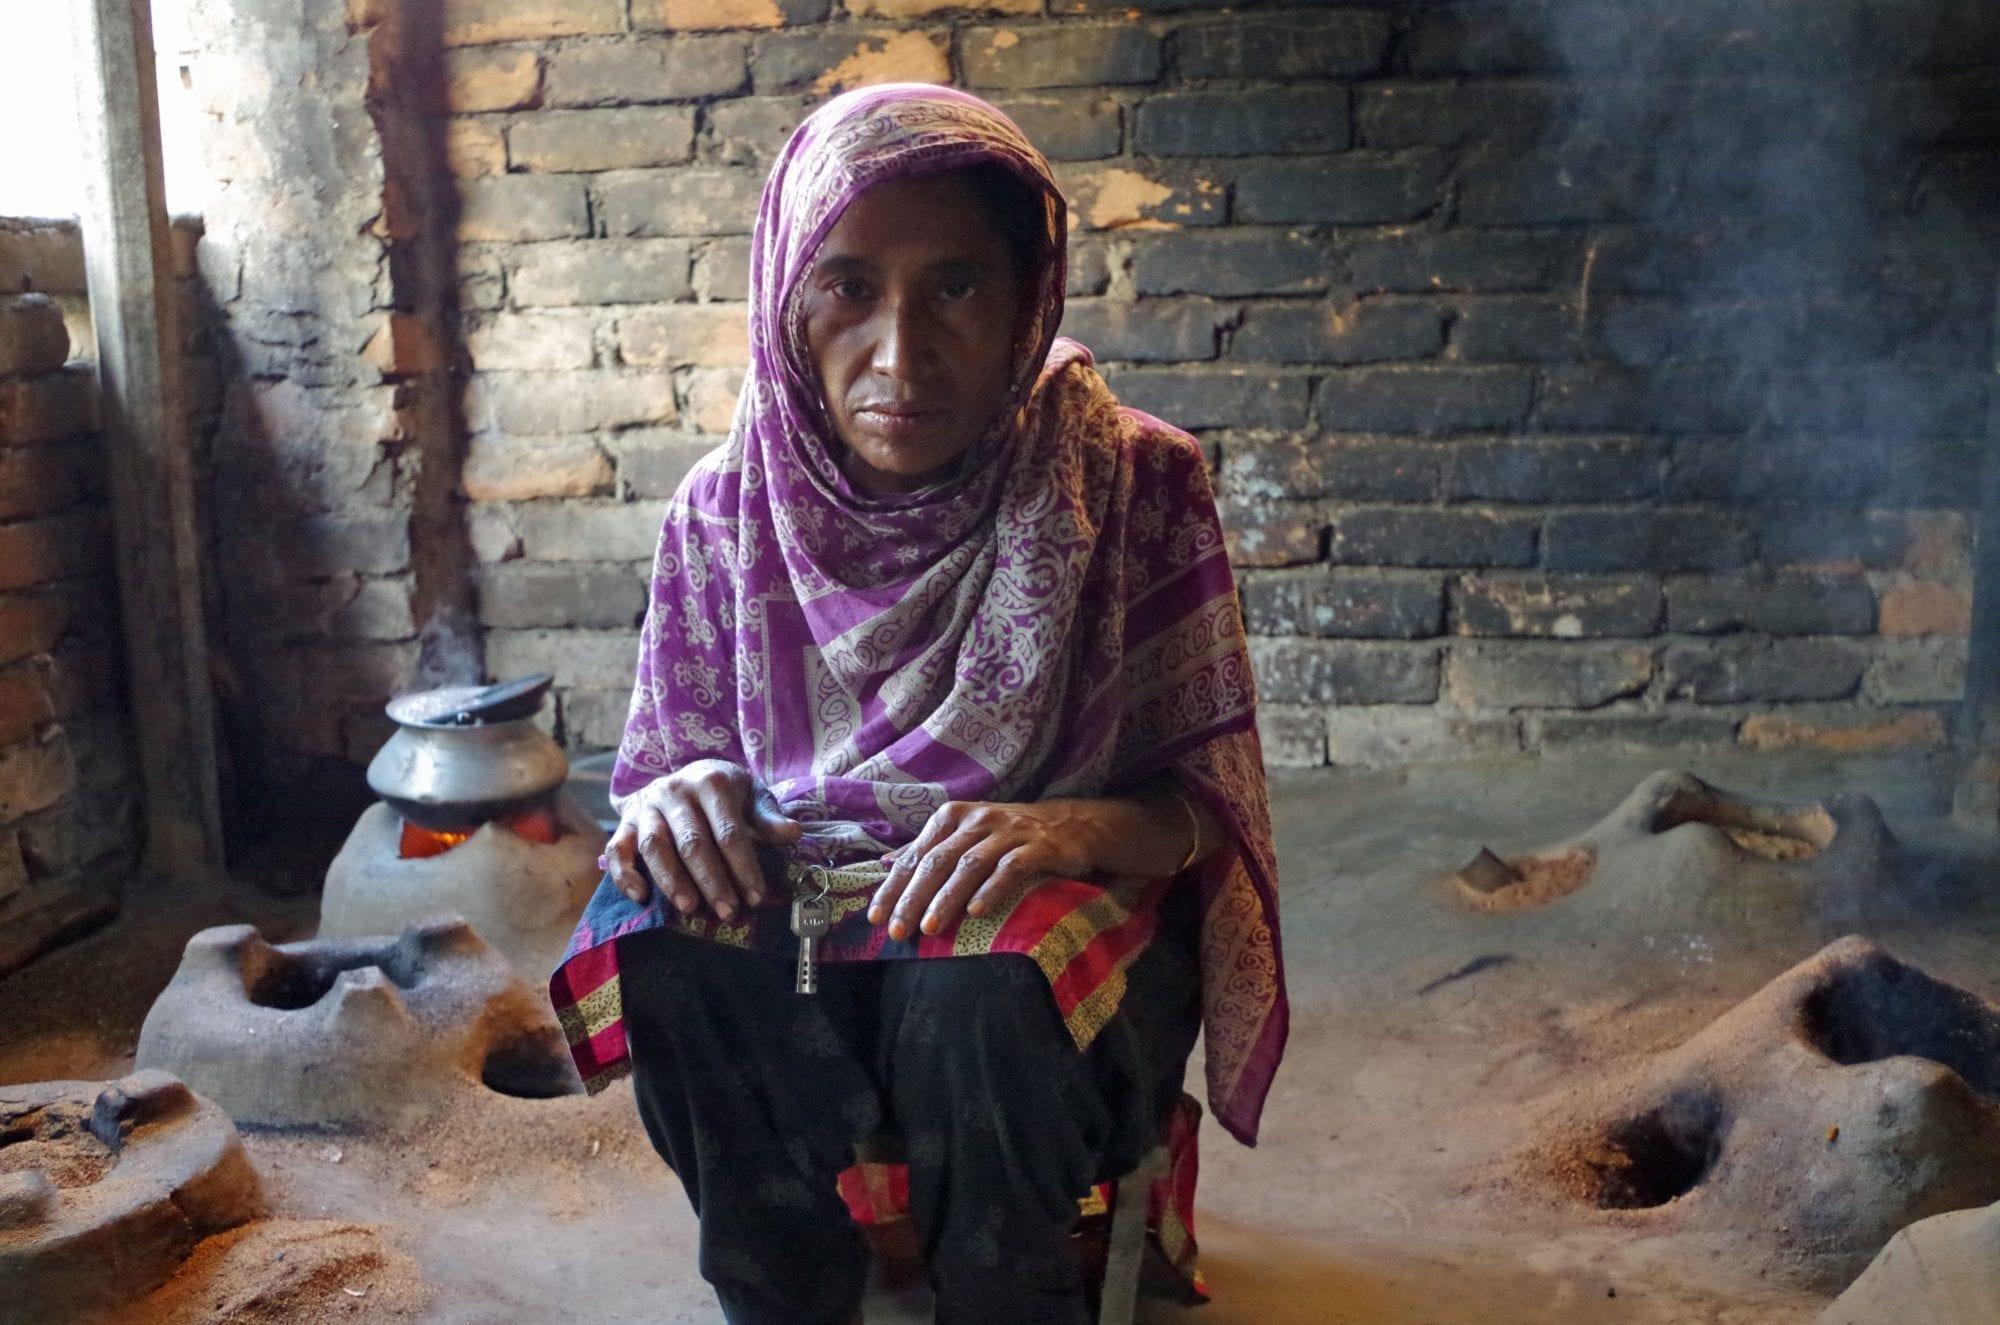 Bangladesh, Solidarity Center, Tazreen, fire safety, garment worker